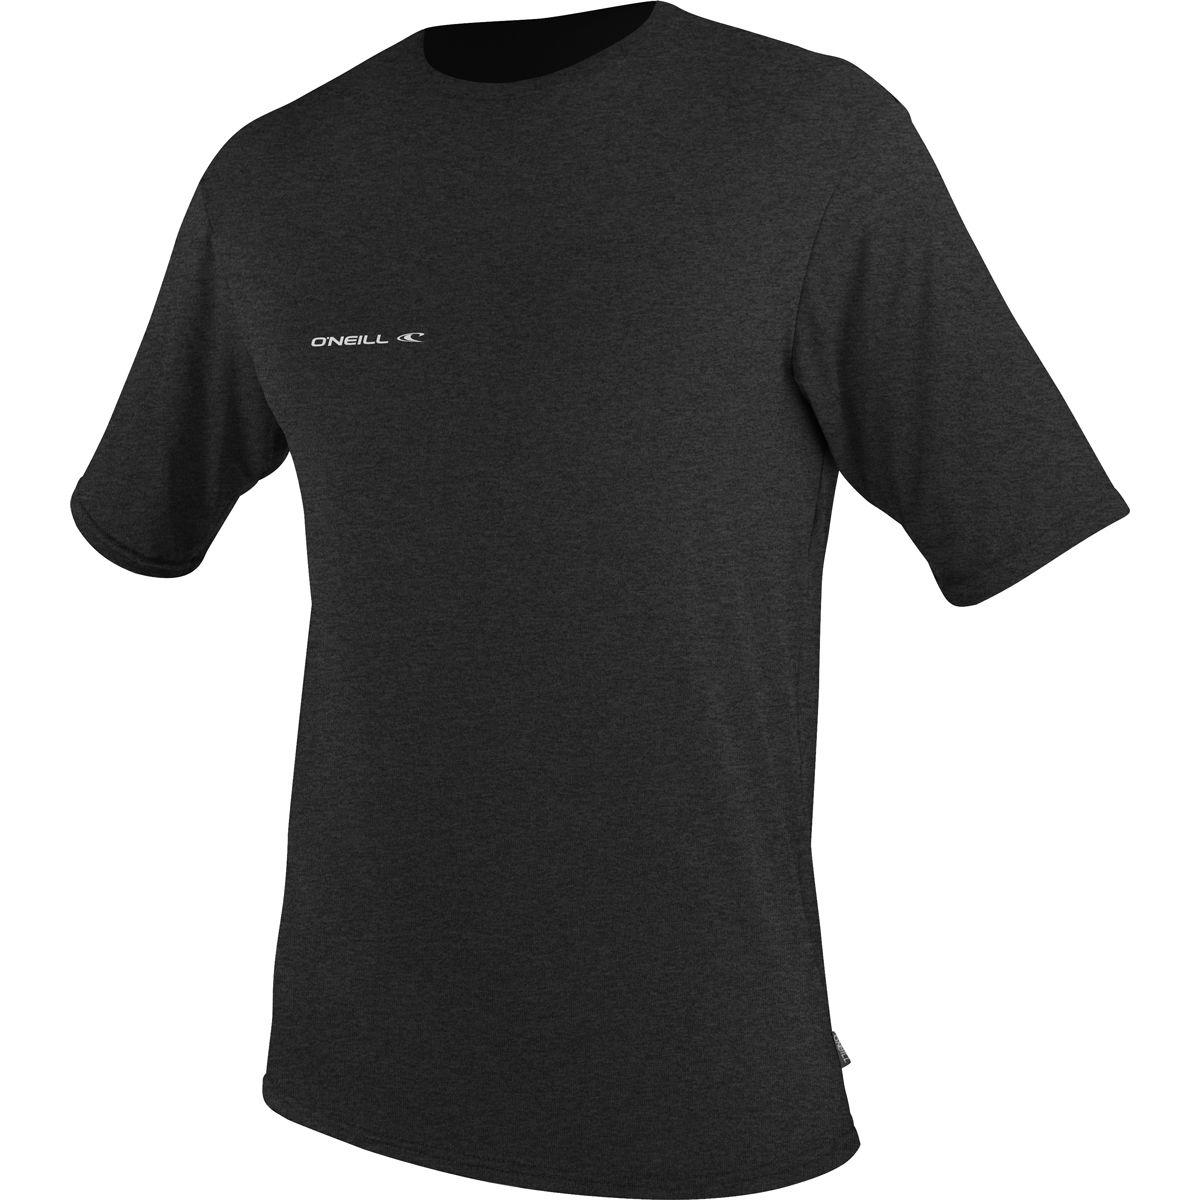 Hybrid Surf Rashguard T-Shirt - Men